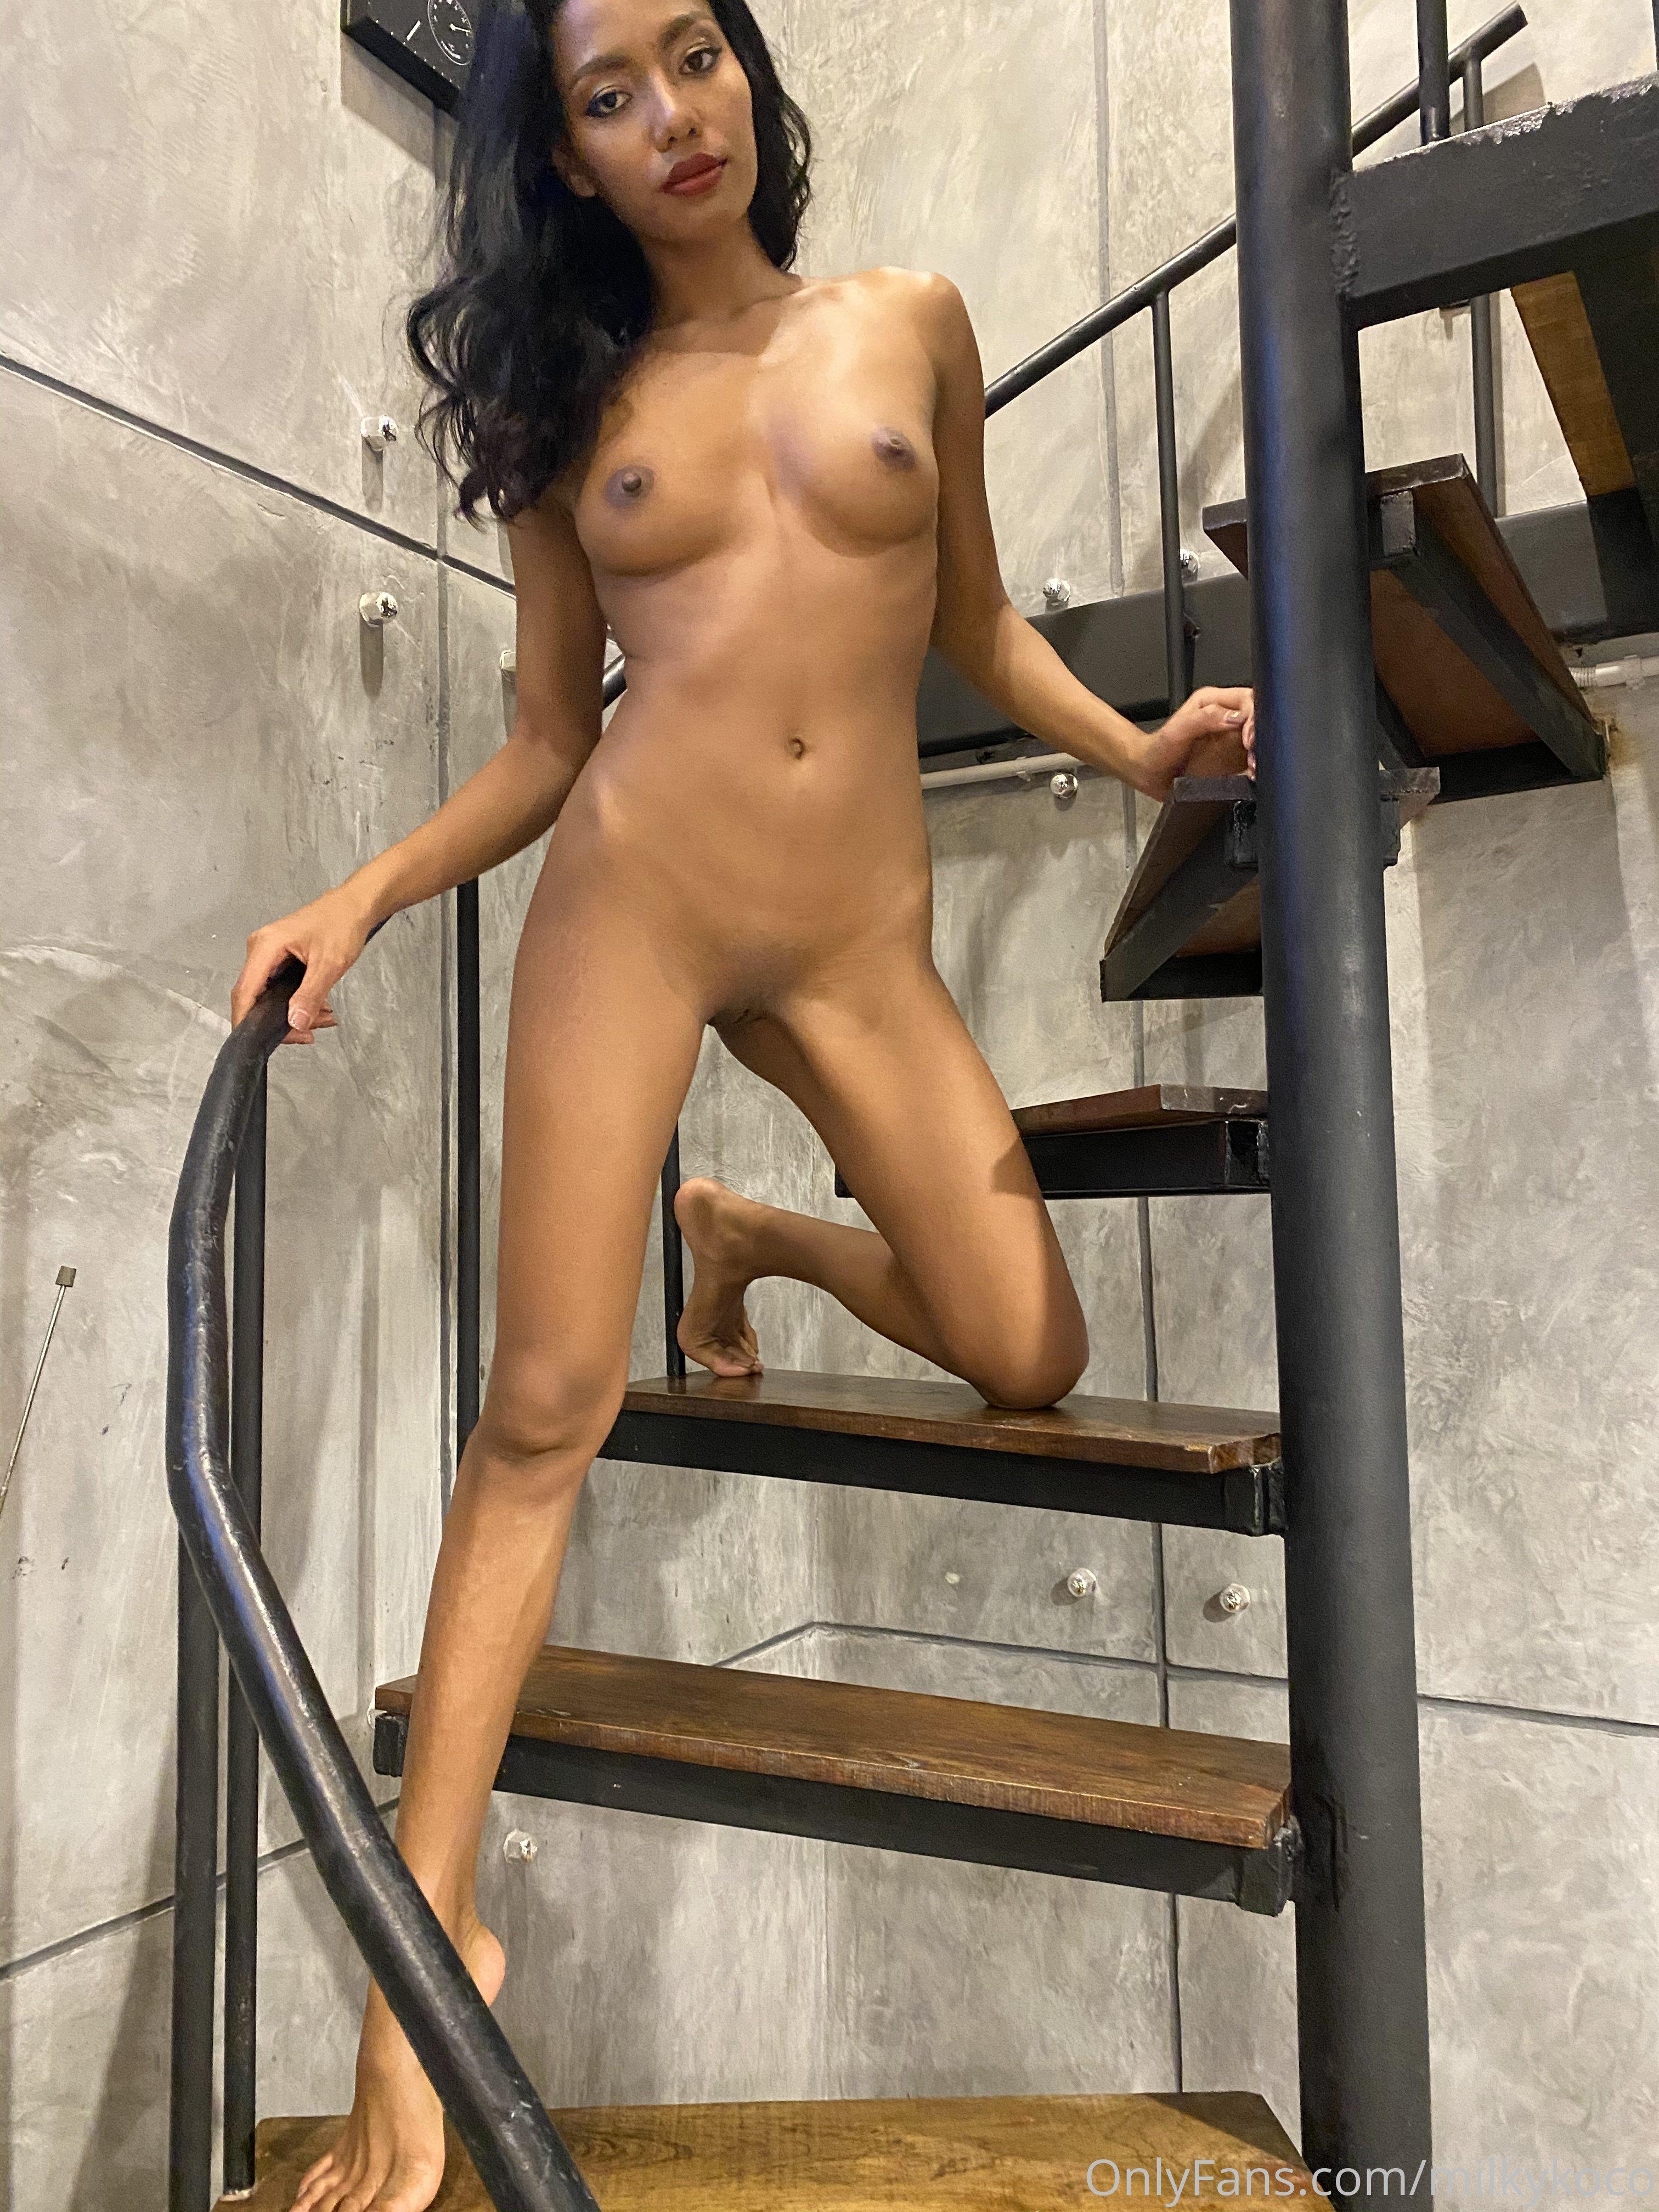 Koko Mylk Bangkok Model Leaked Onlyfans 0053